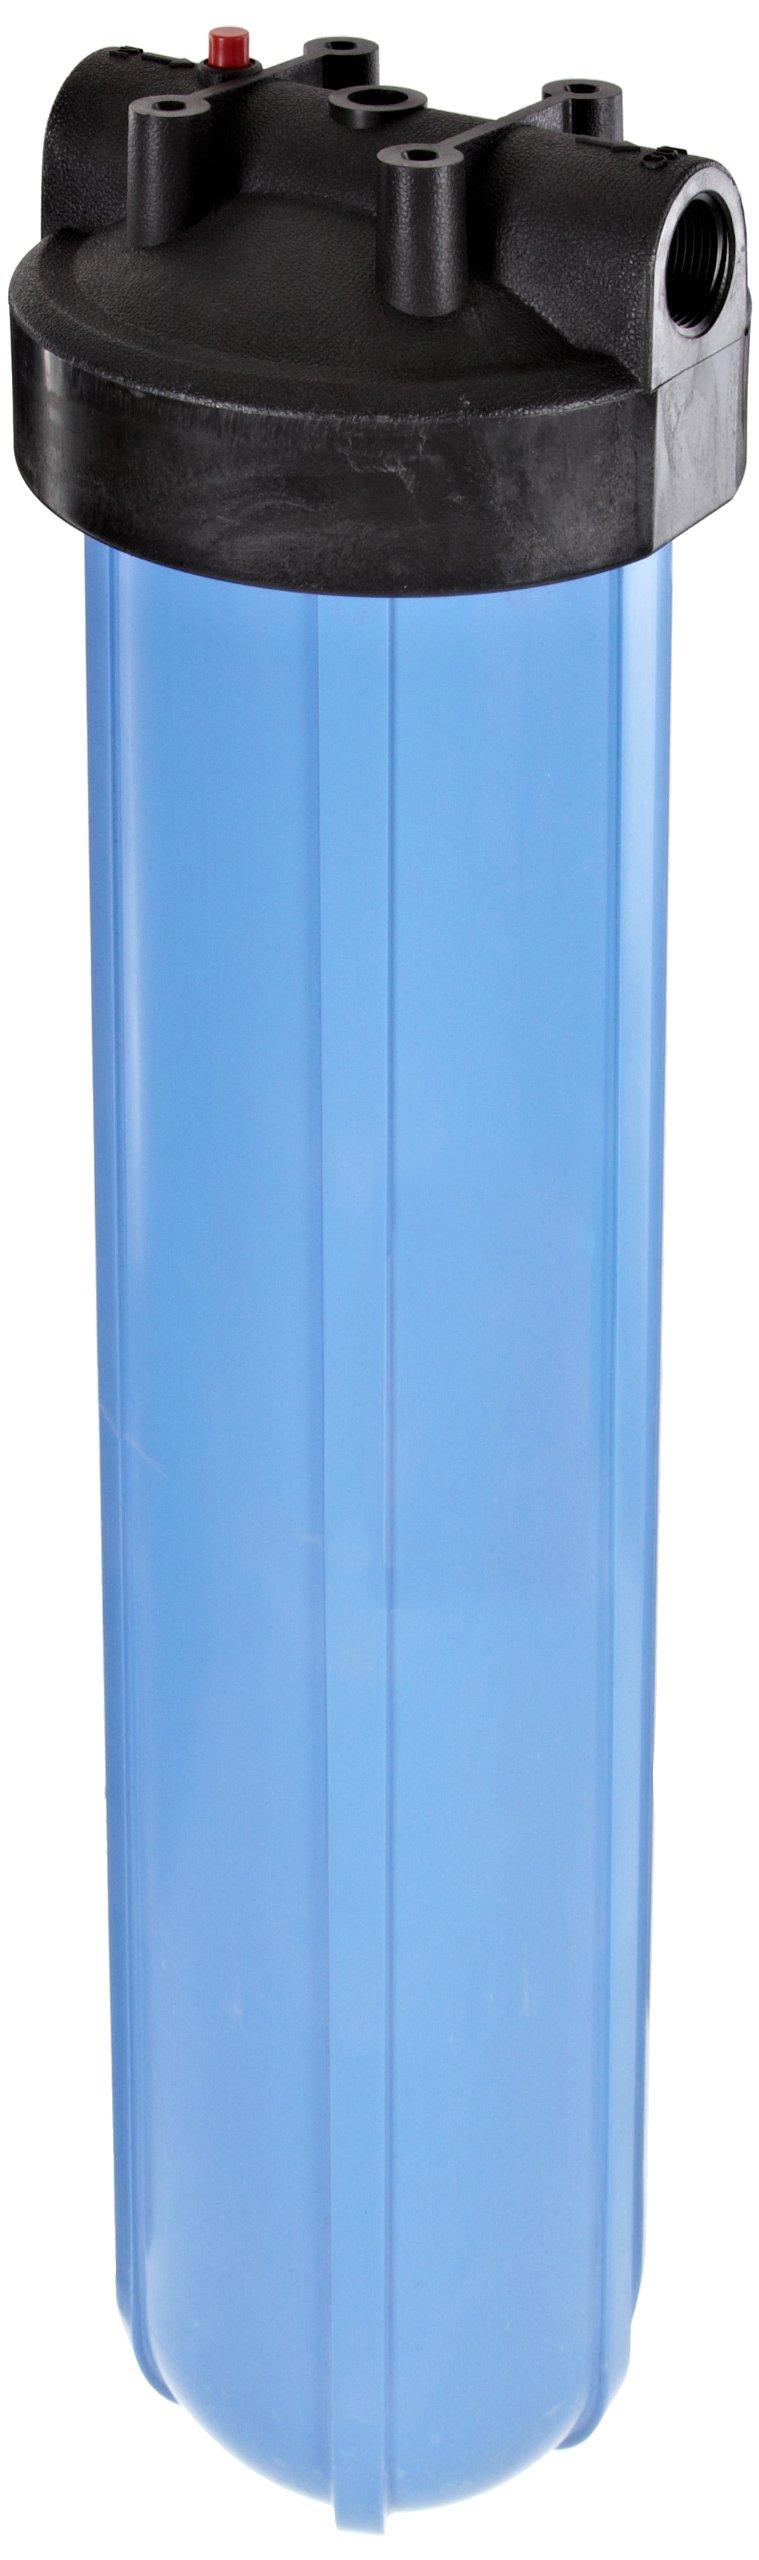 Pentek 150233, Big Blue, 1'' In/Out, #20 Blue/Black, HFPP, w/ PR by Pentek